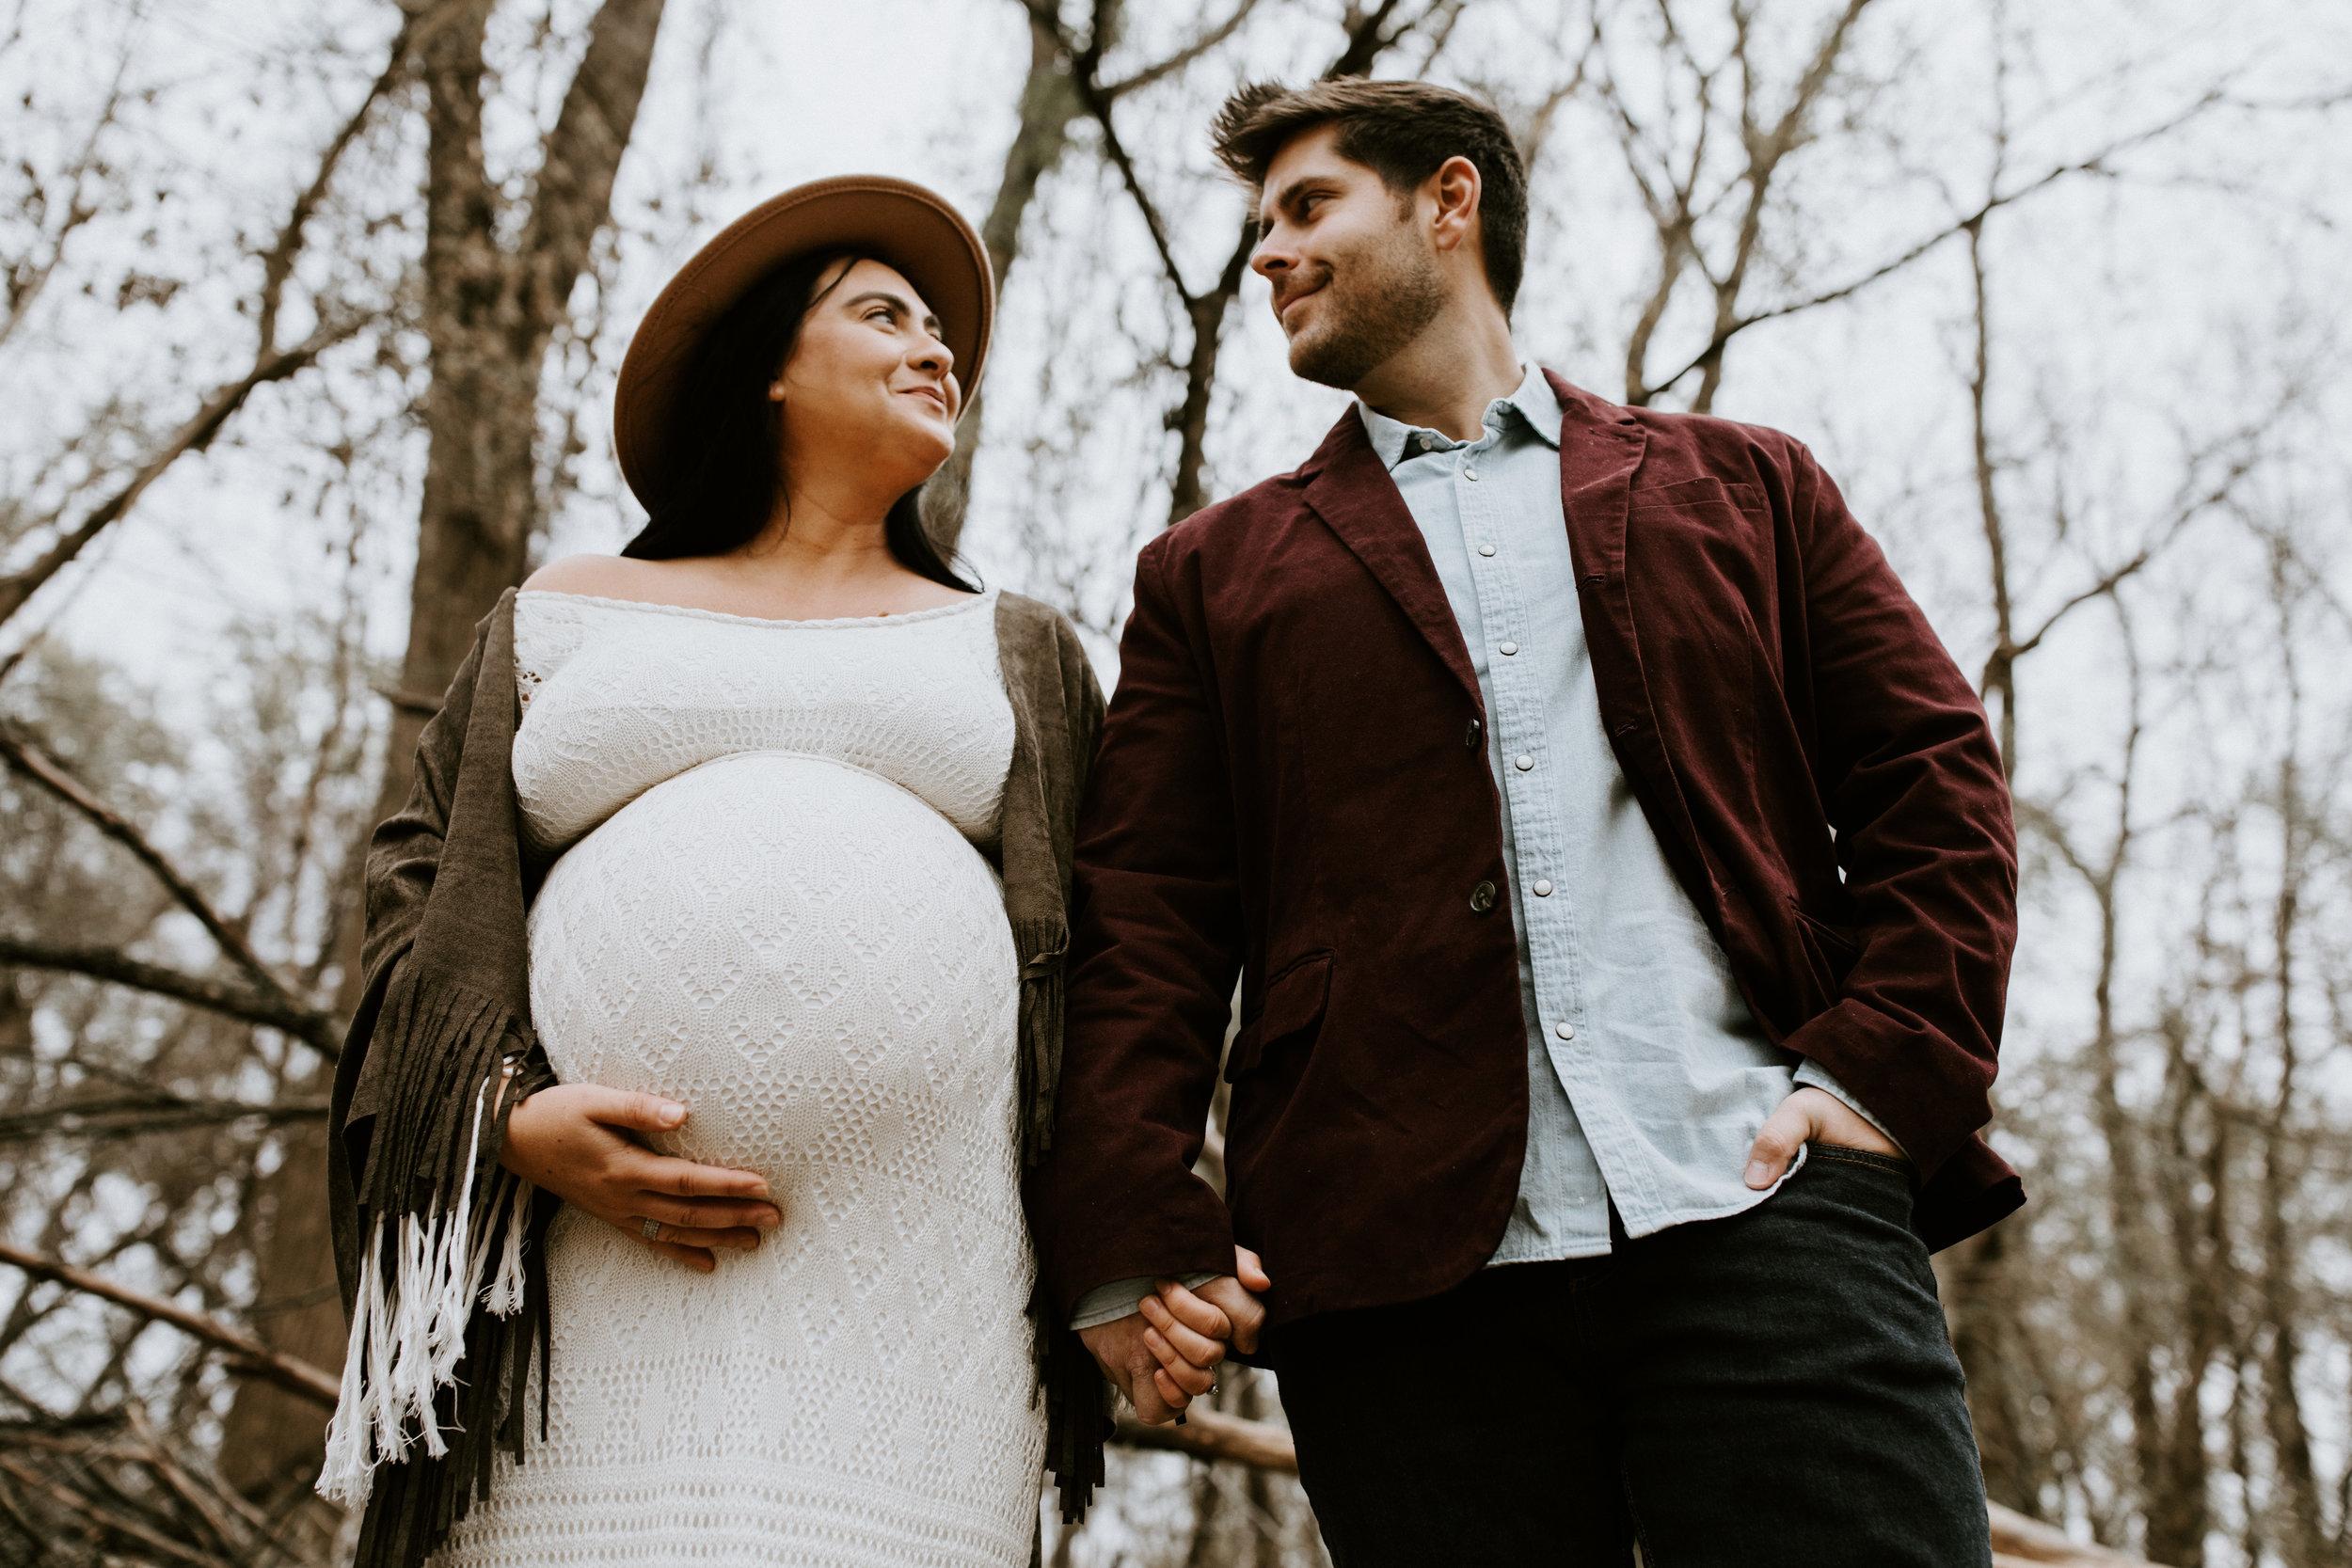 st-louis-missouri-photographer-maternity-KAMIV-125.jpg